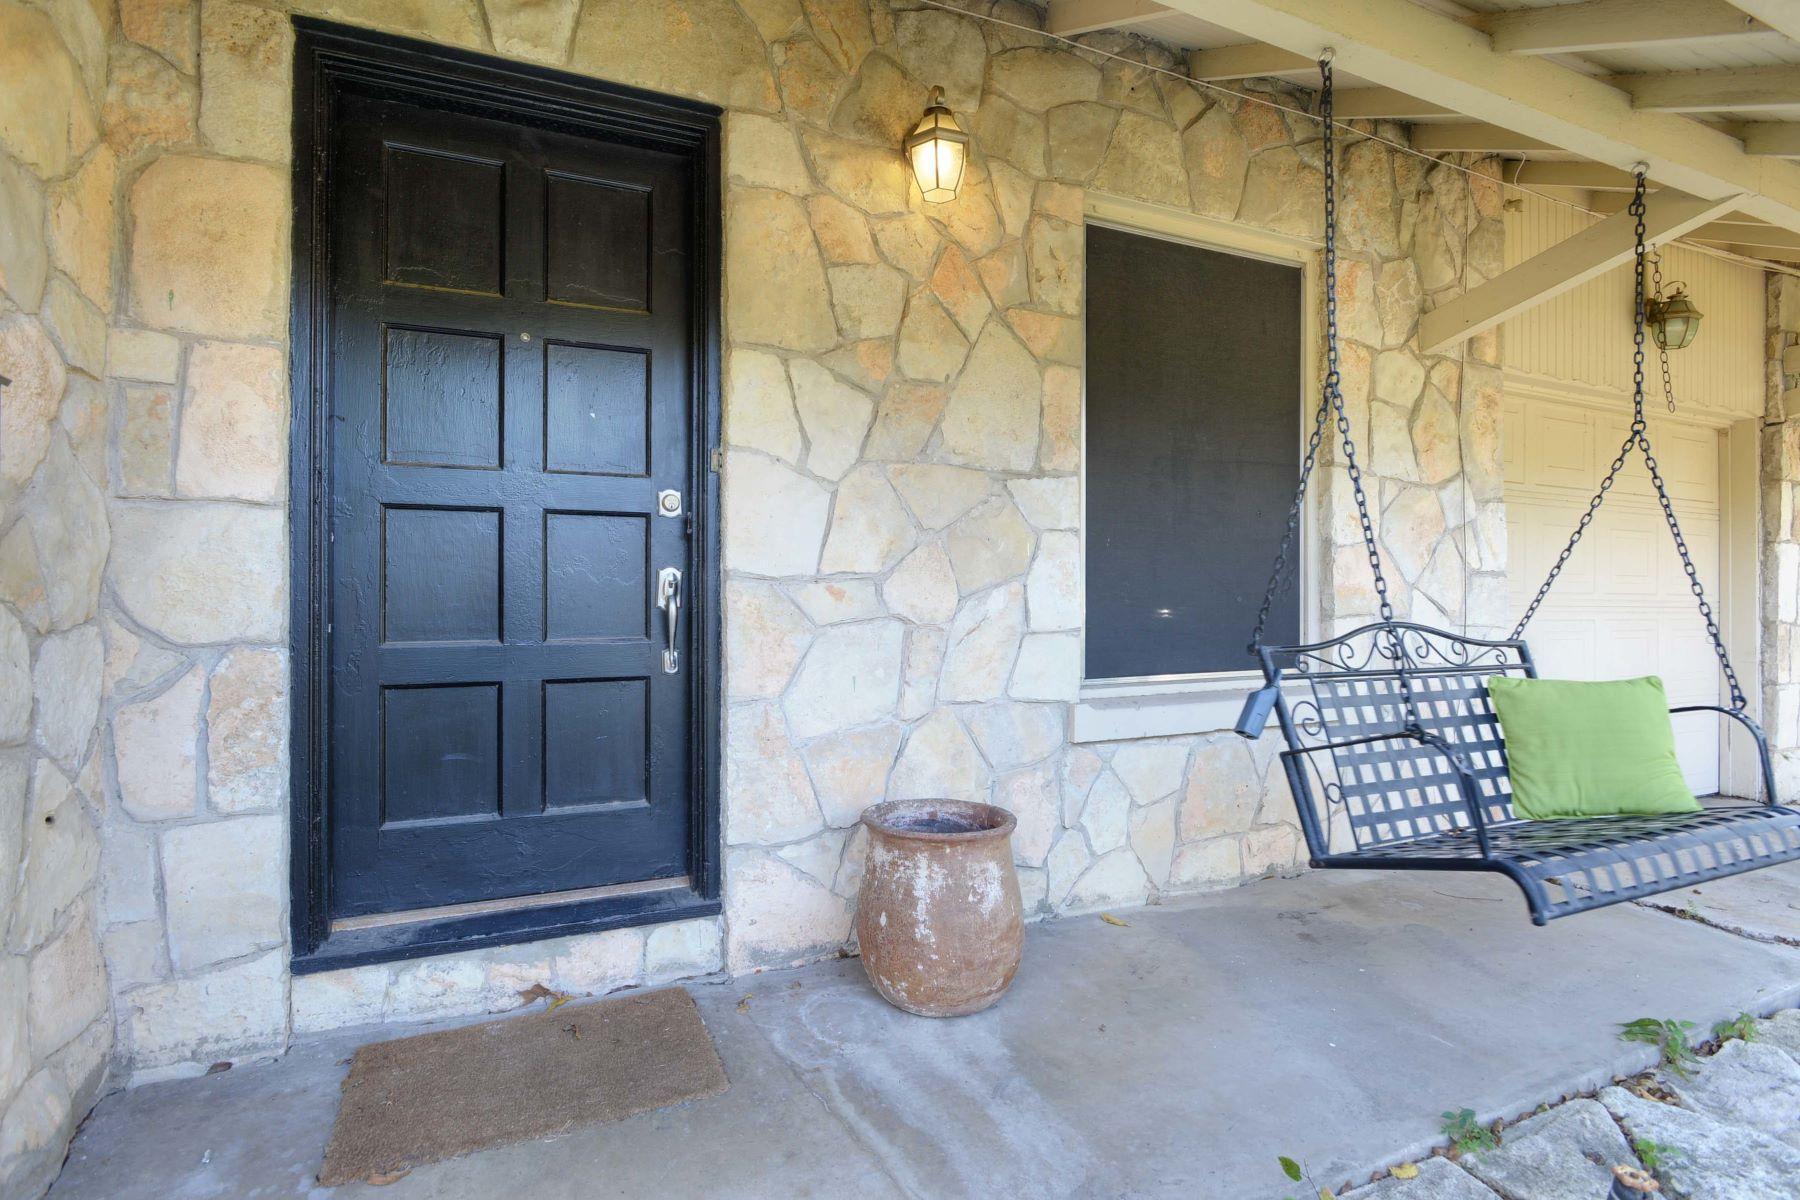 Single Family Home for Rent at 238 Lovera Blvd 238 Lovera Blvd San Antonio, Texas 78212 United States